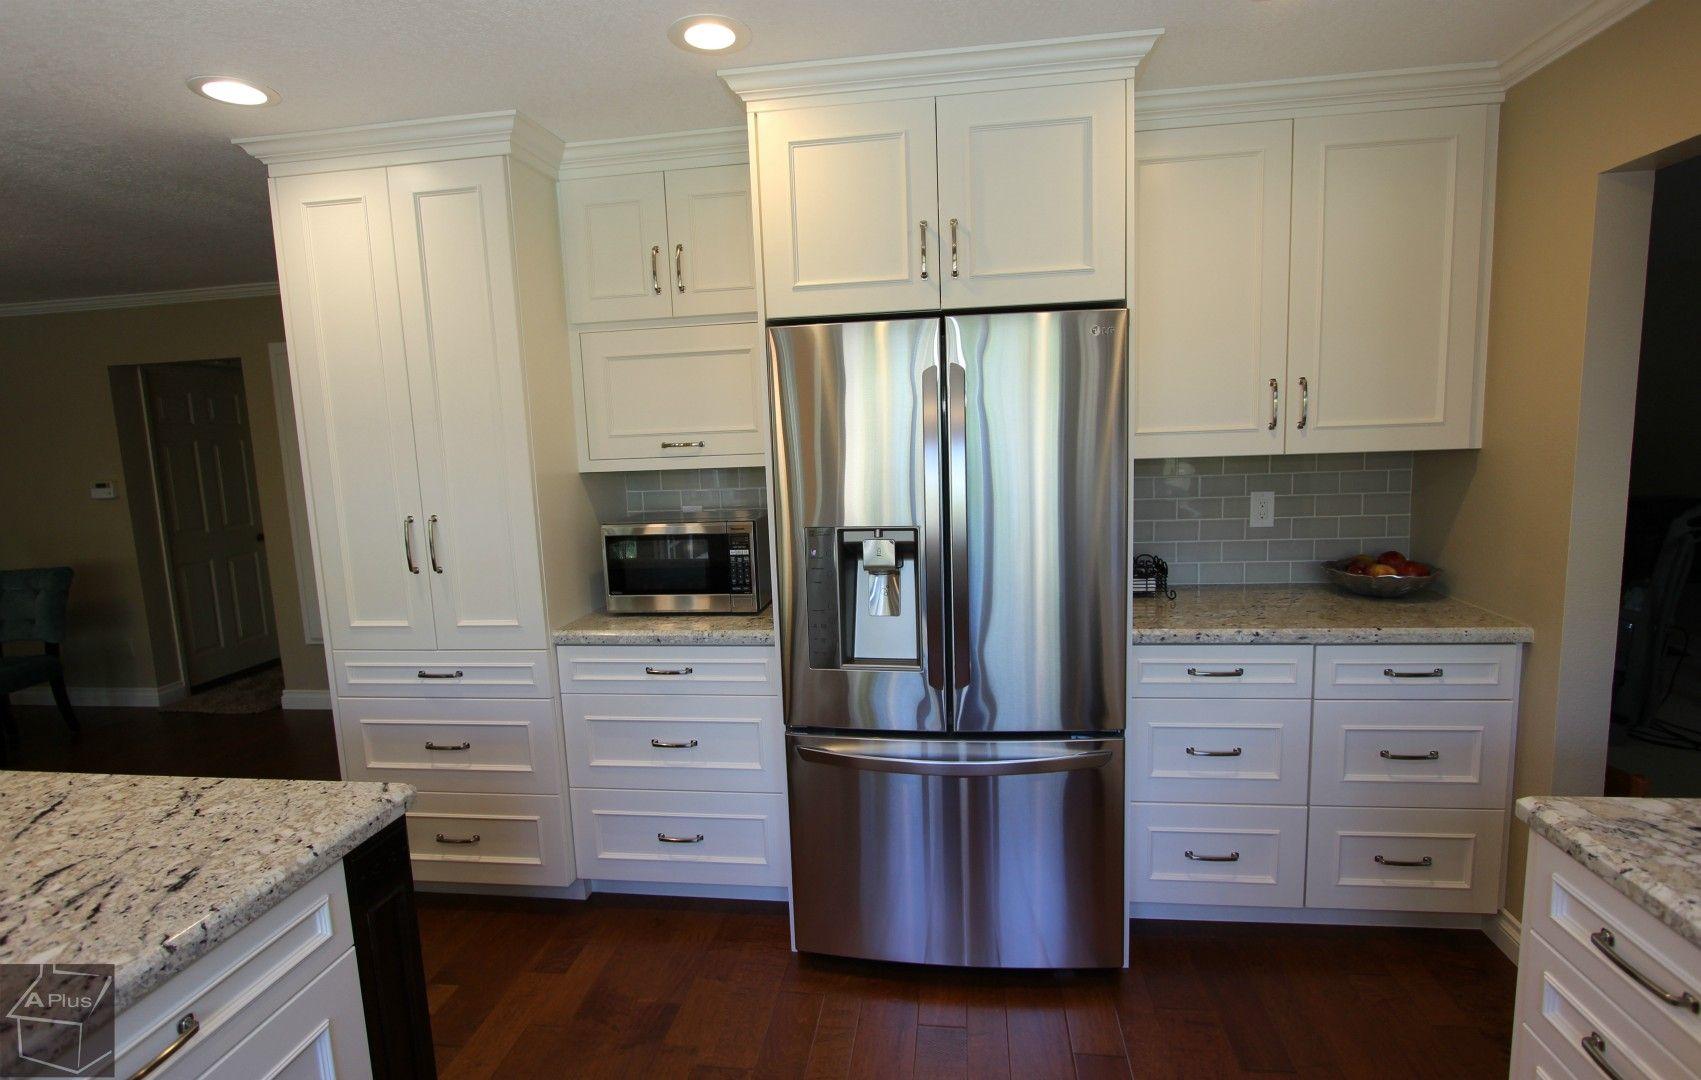 kitchen cabinet covered freeze beautifully   80 - irvine - kitchen